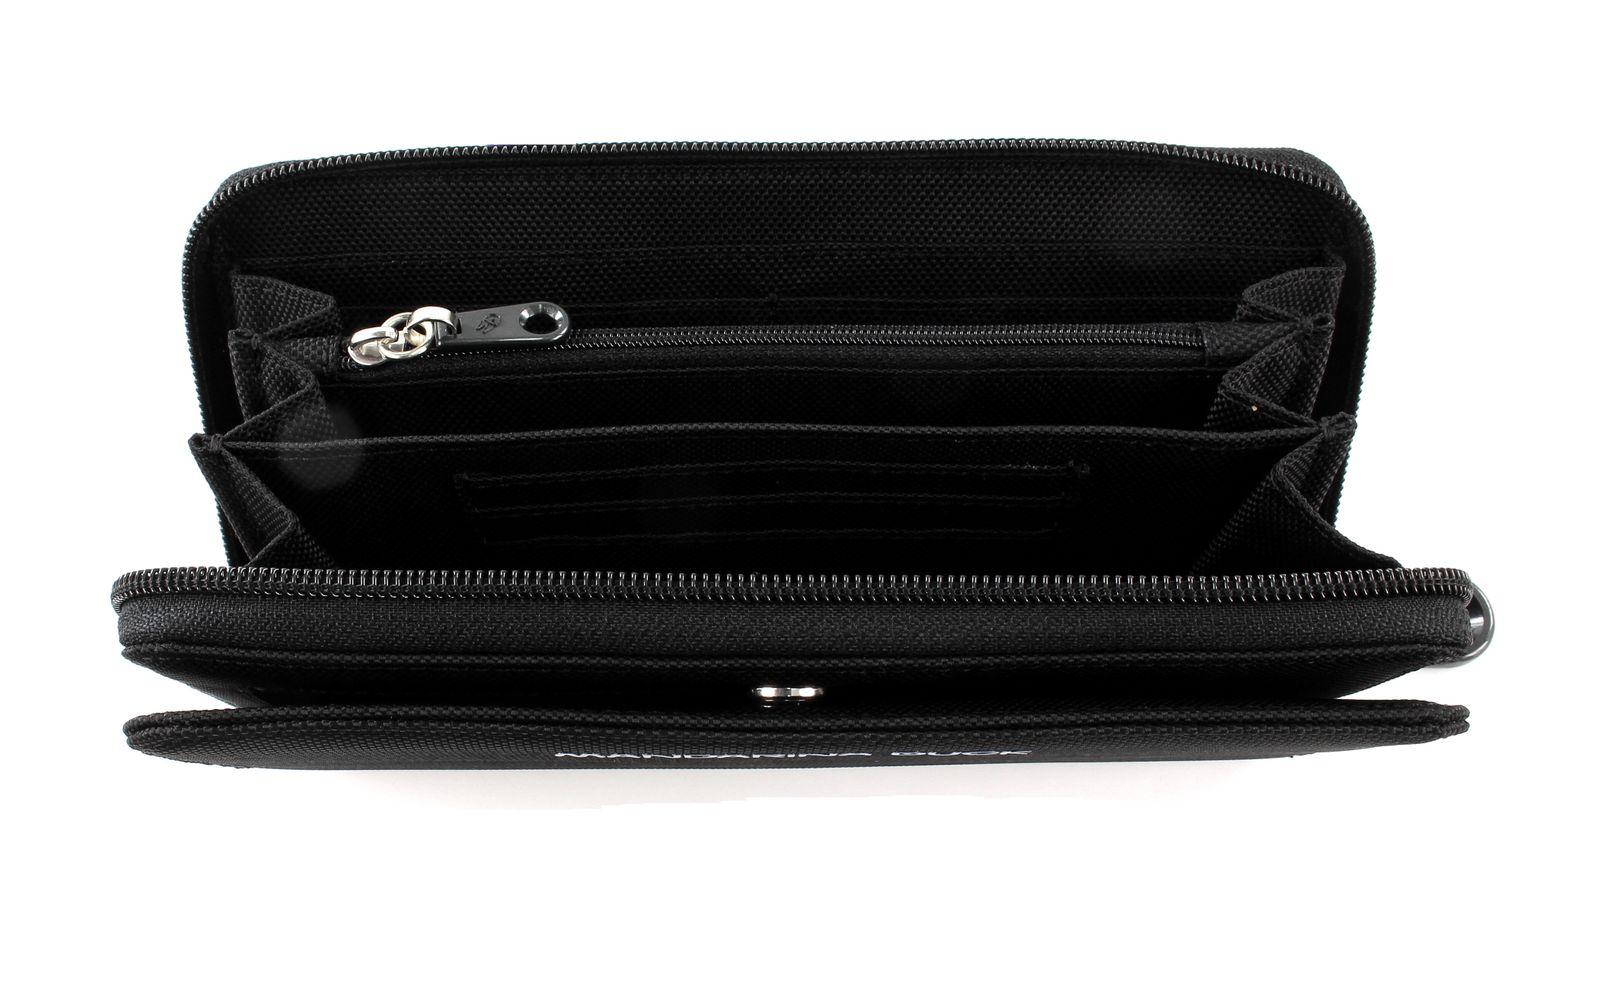 MANDARINA DUCK MD20 Zip Wallet L Black